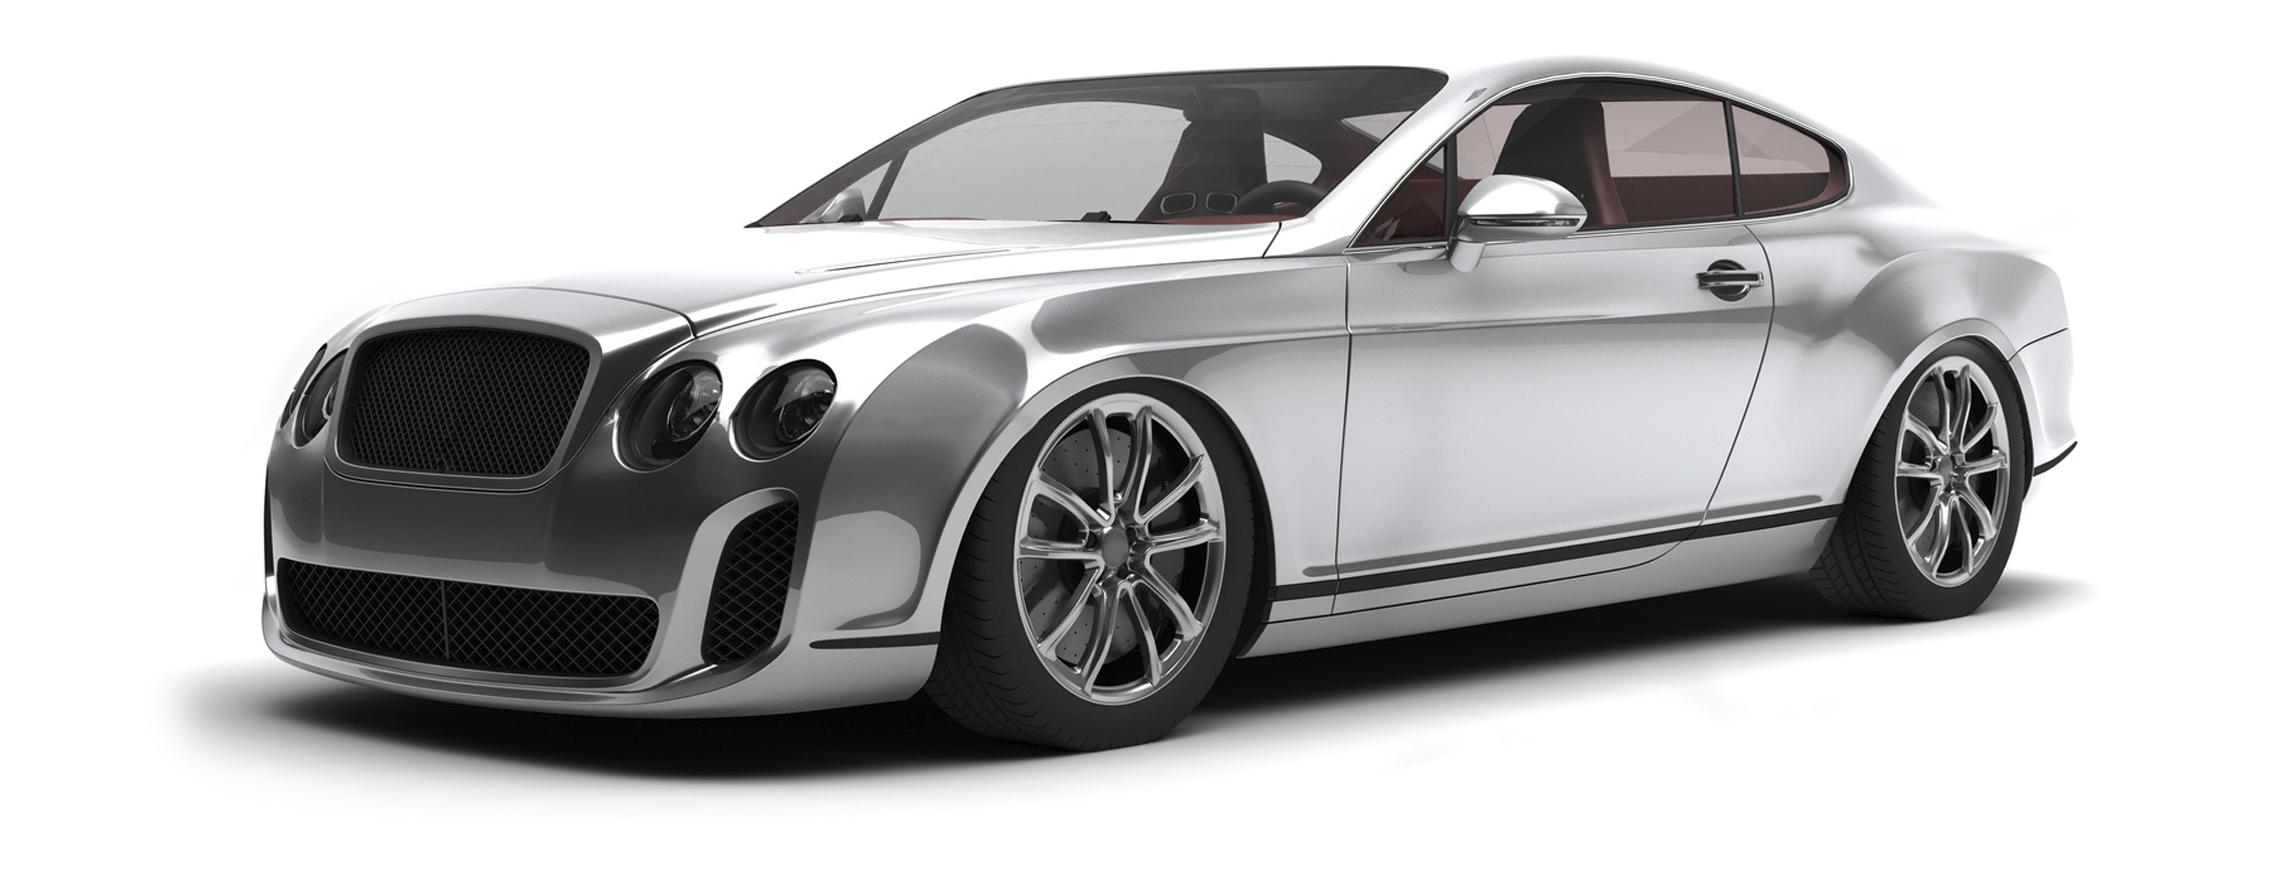 Fahrzeugvermarktung-Fahrzeug Freisteller